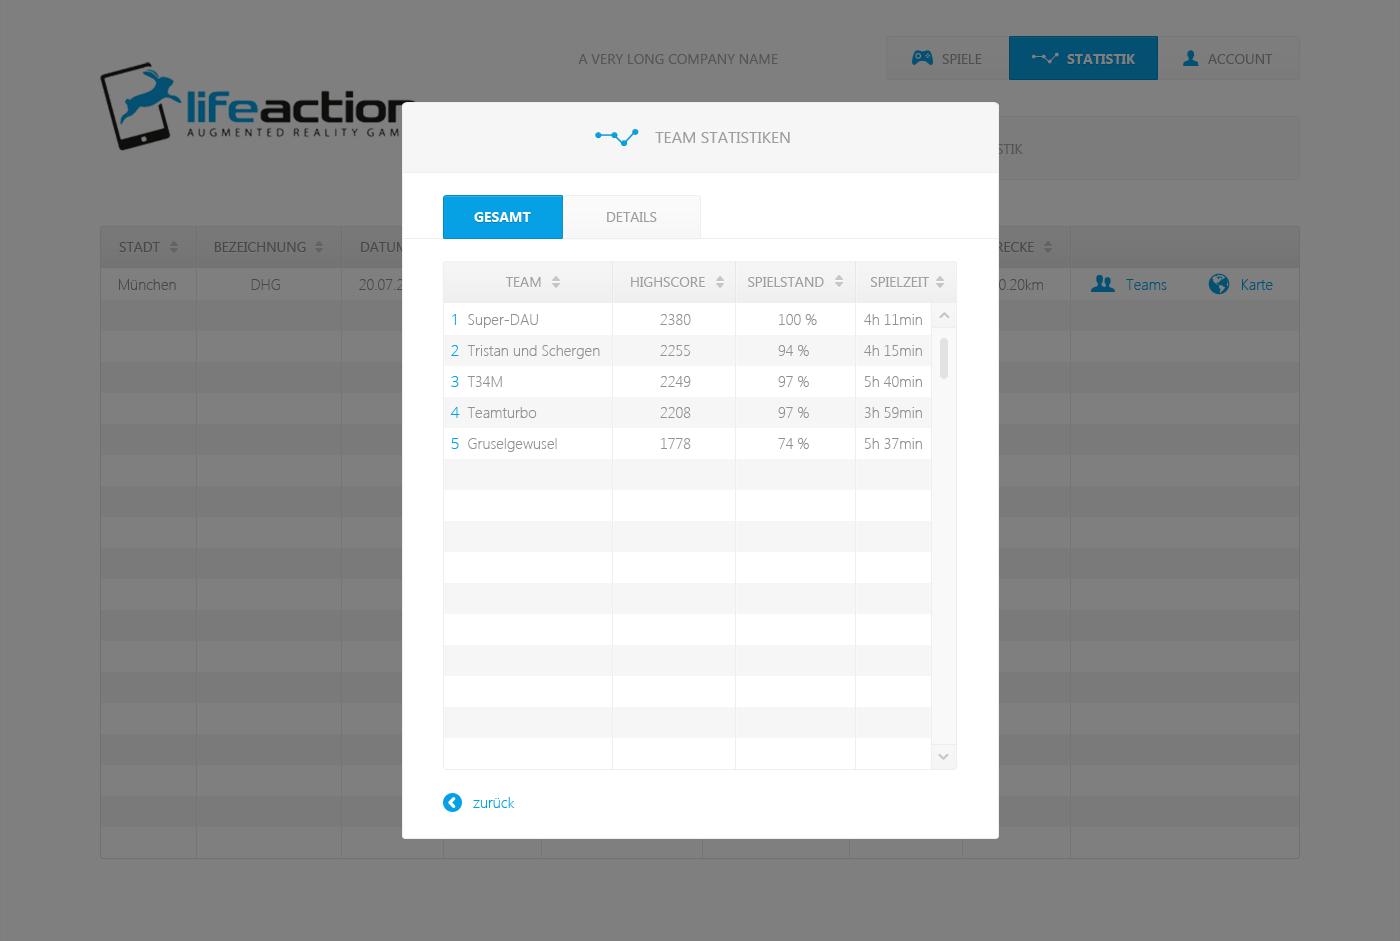 lifeaction games benötigt ein website or app design